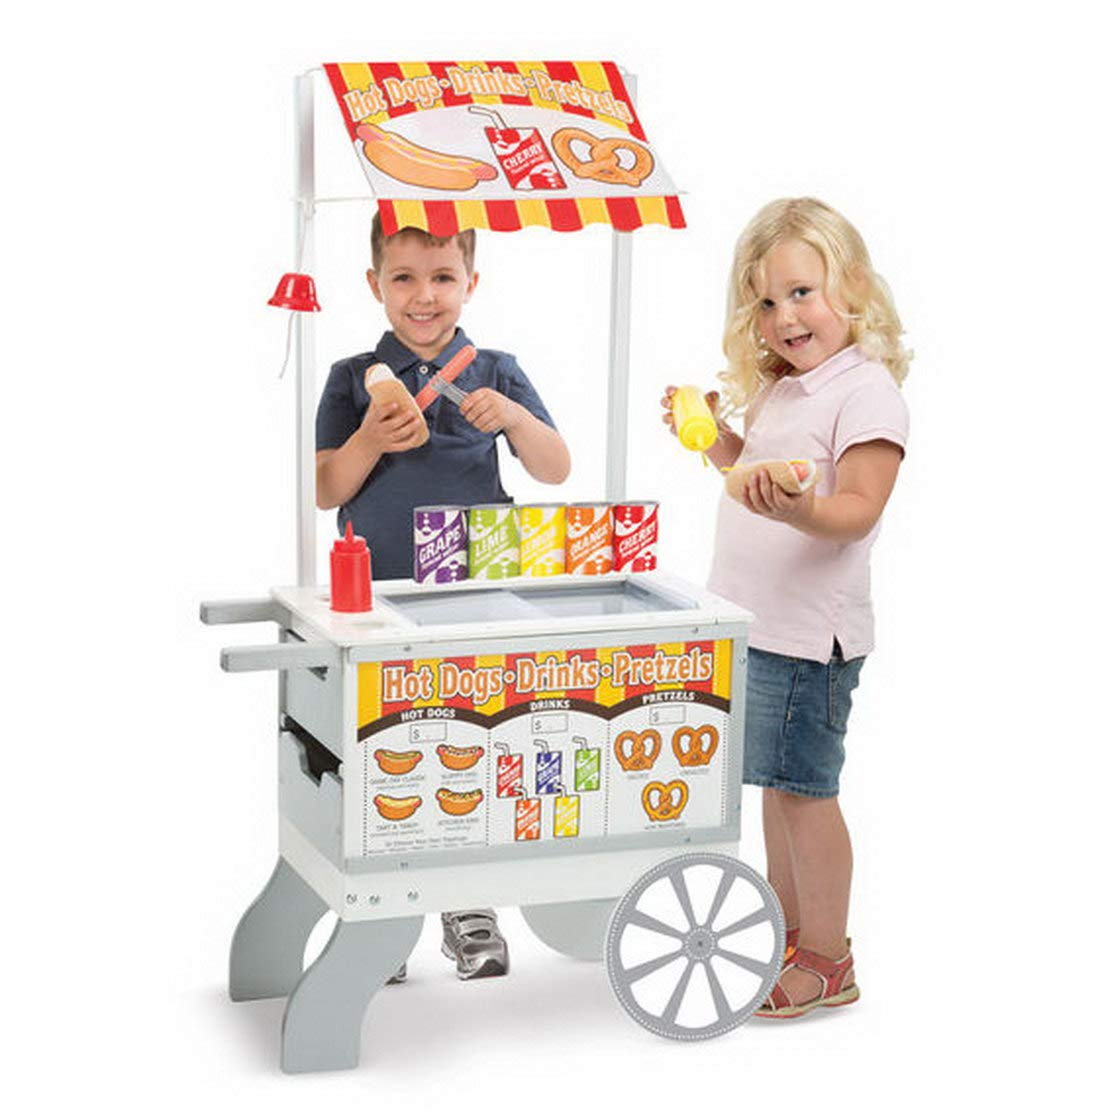 Woodega - Niños Madera Juguete Aperitivos & Sweets Food Cart, Hielo Carro Hot Dog Stand Hielo Carga 125 x 65 x, Plata: Amazon.es: Juguetes y juegos